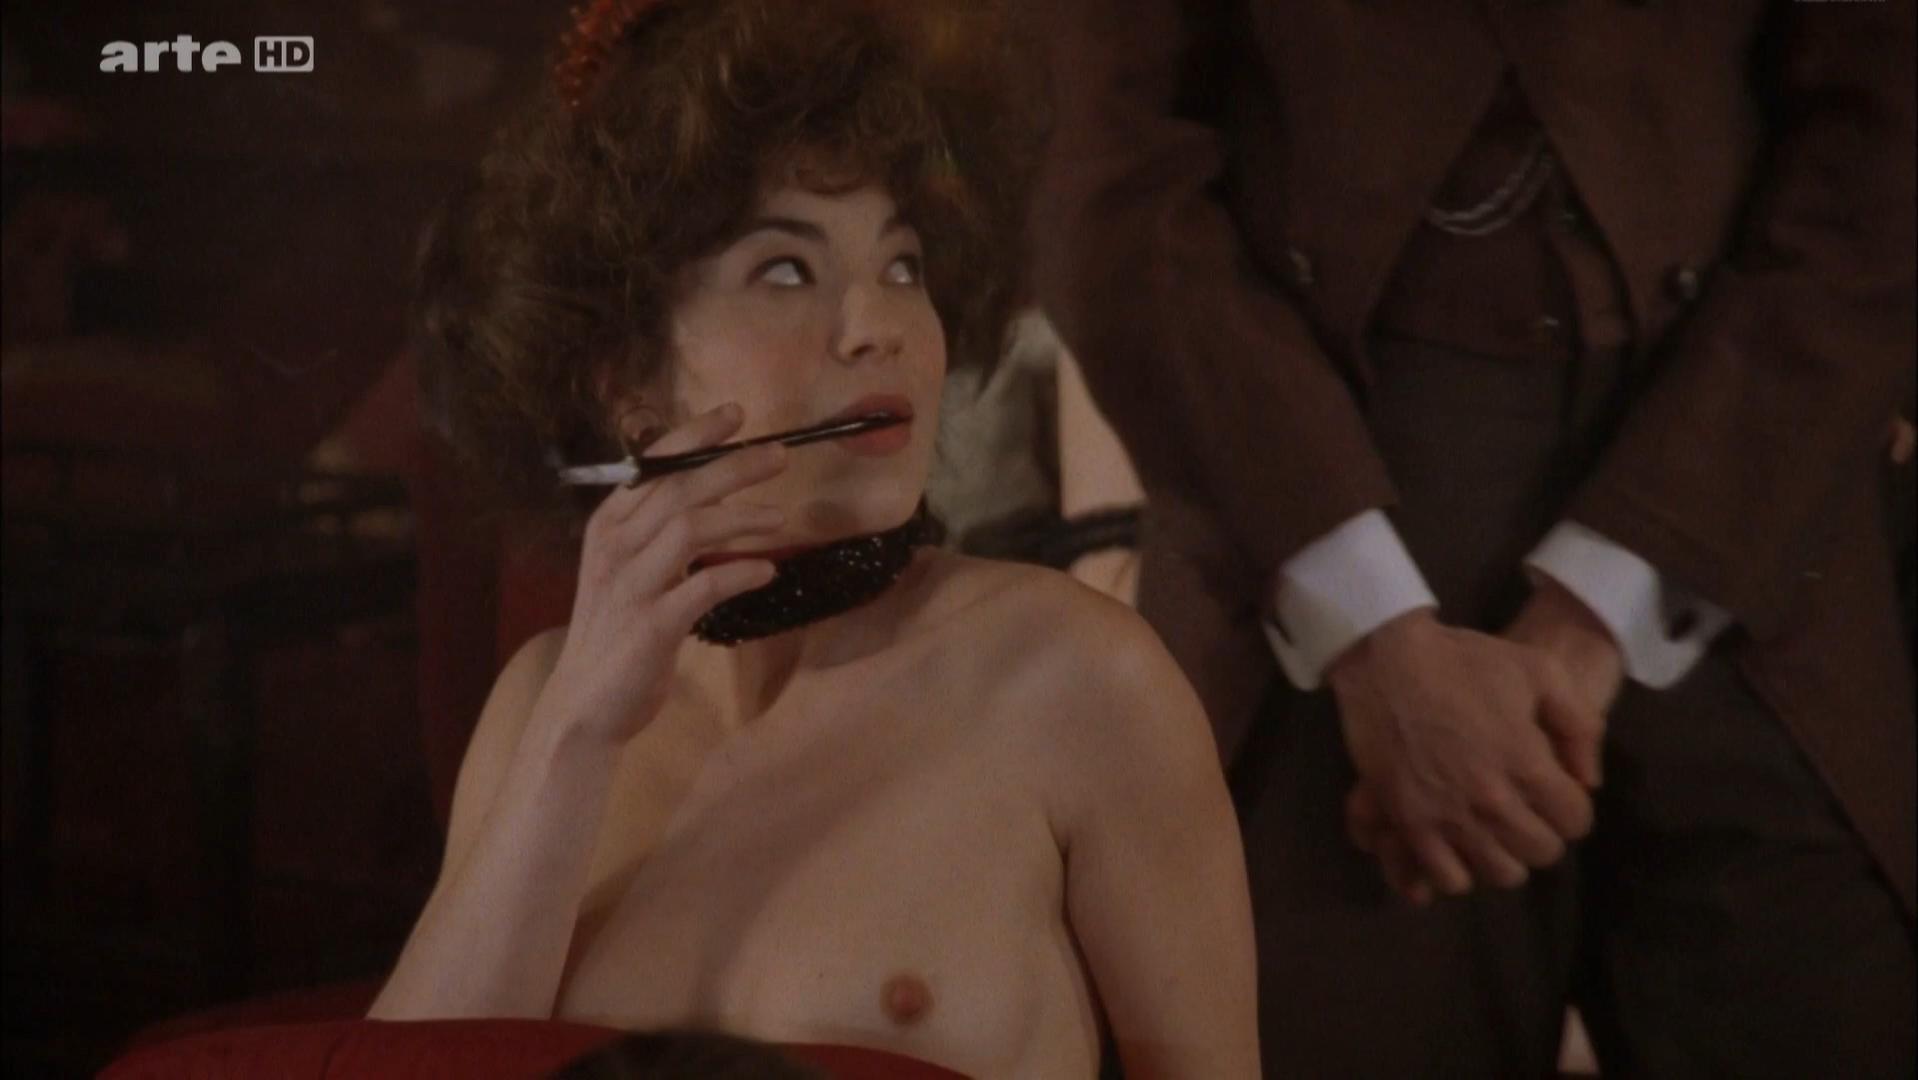 Sara Pasquier nude, Zoe Nonn nude - A la recherche du temps perdu (2010)